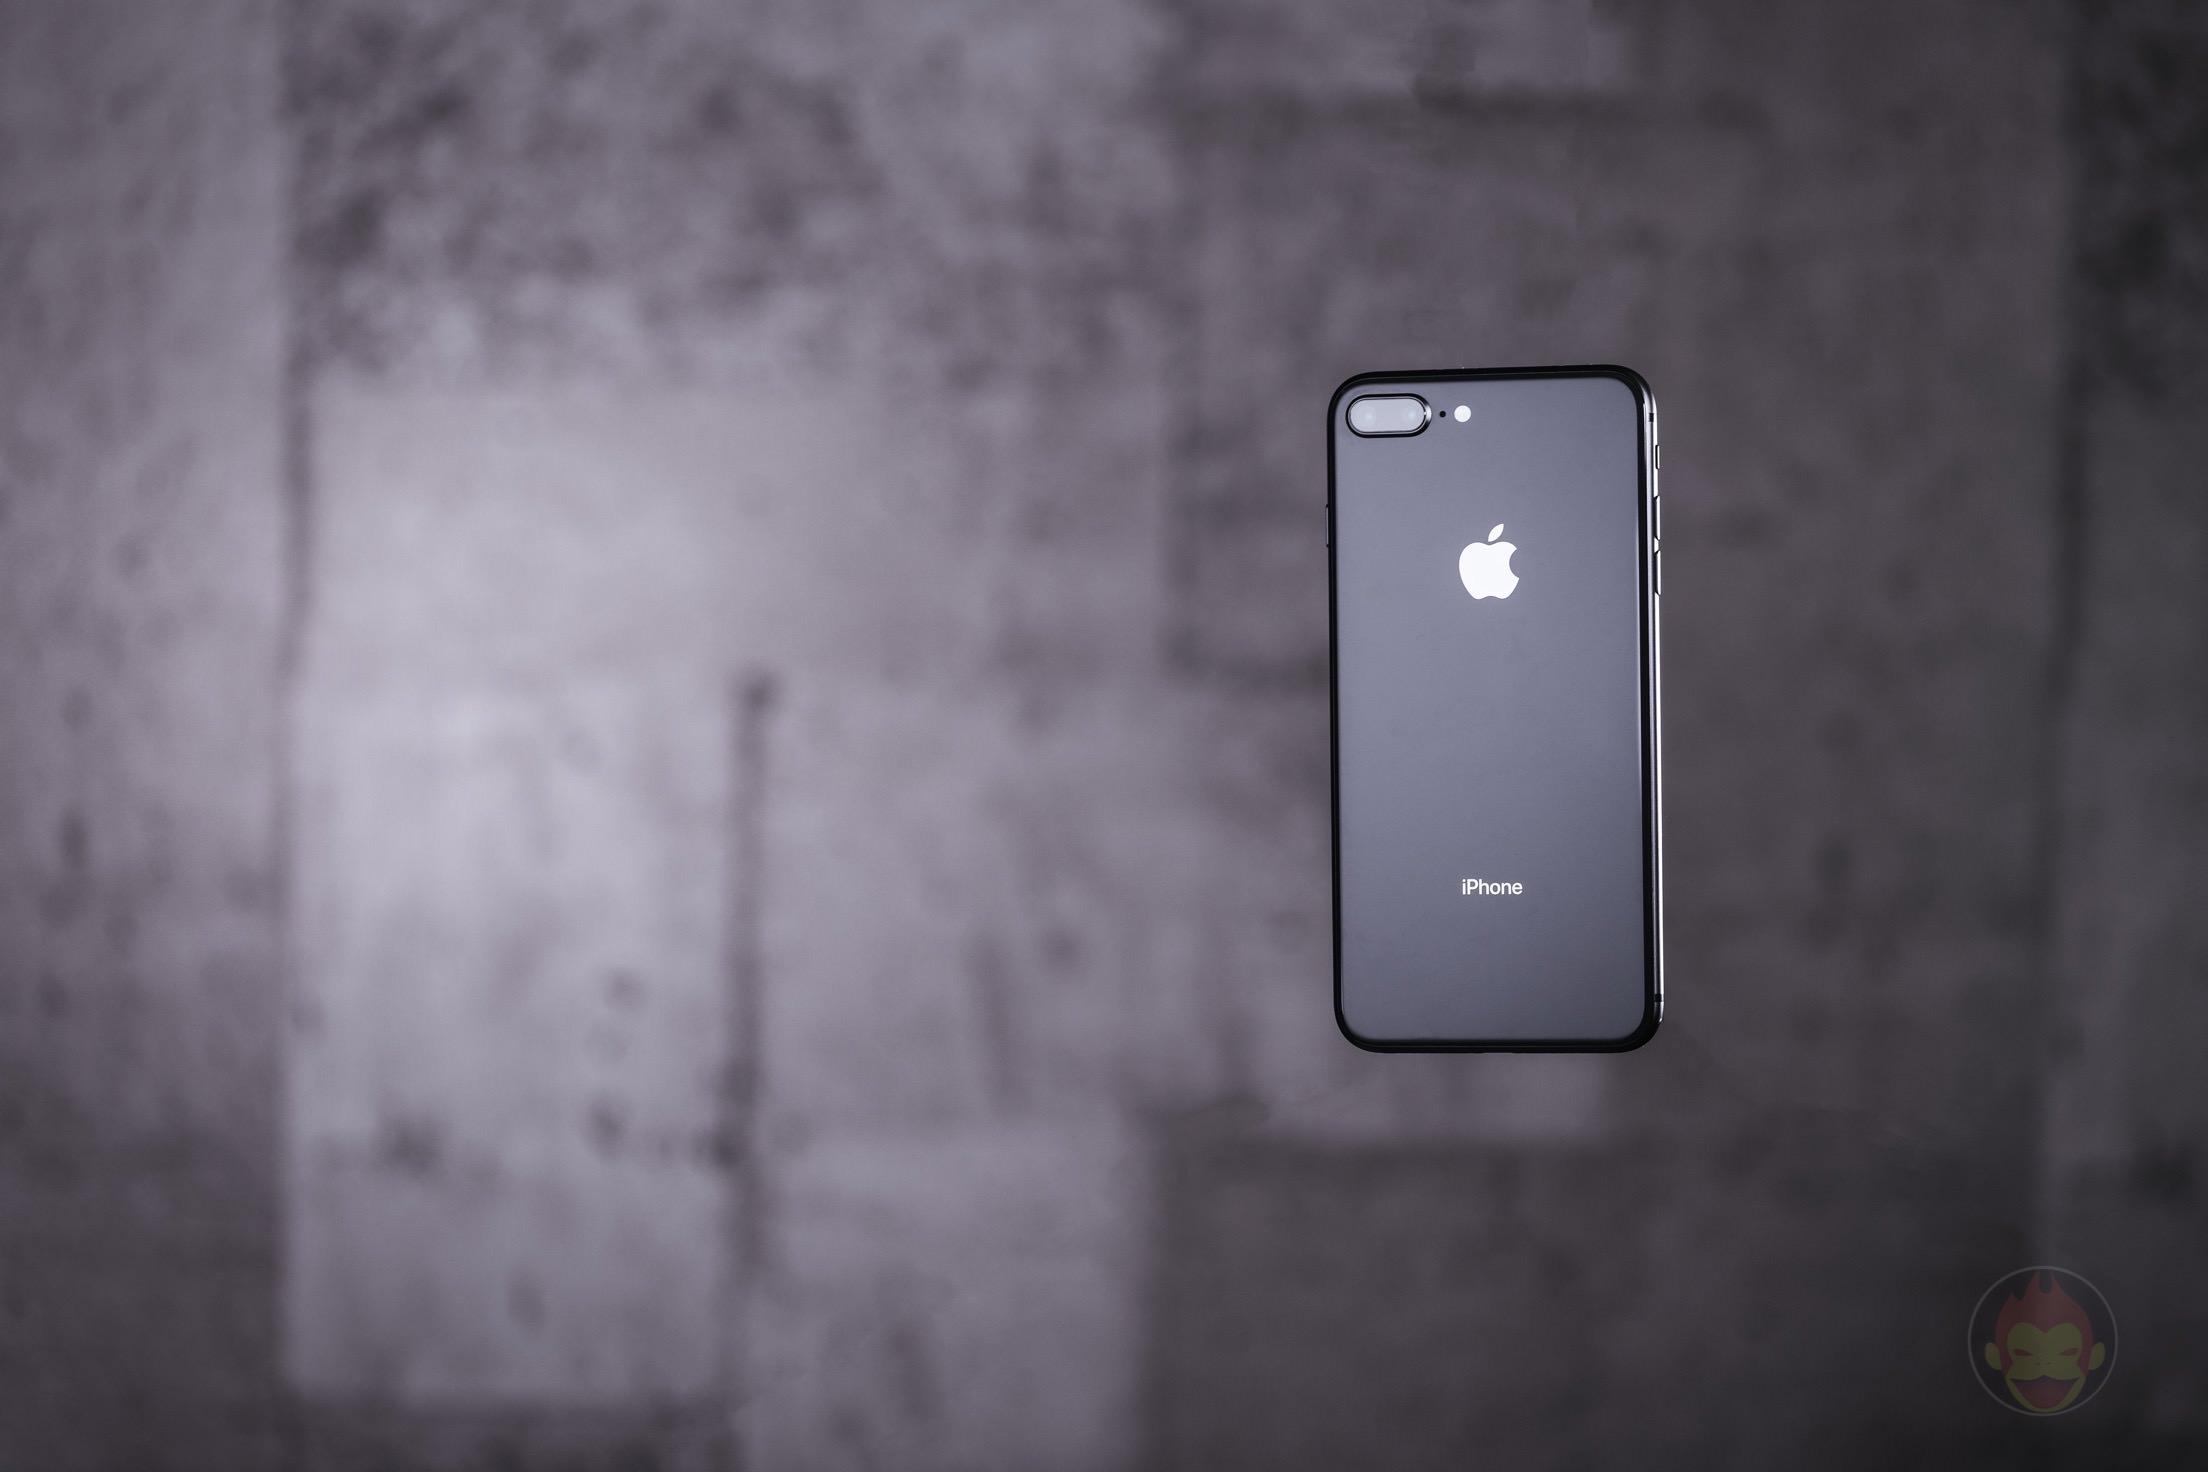 iPhone8-8Plus-Review-06.jpg